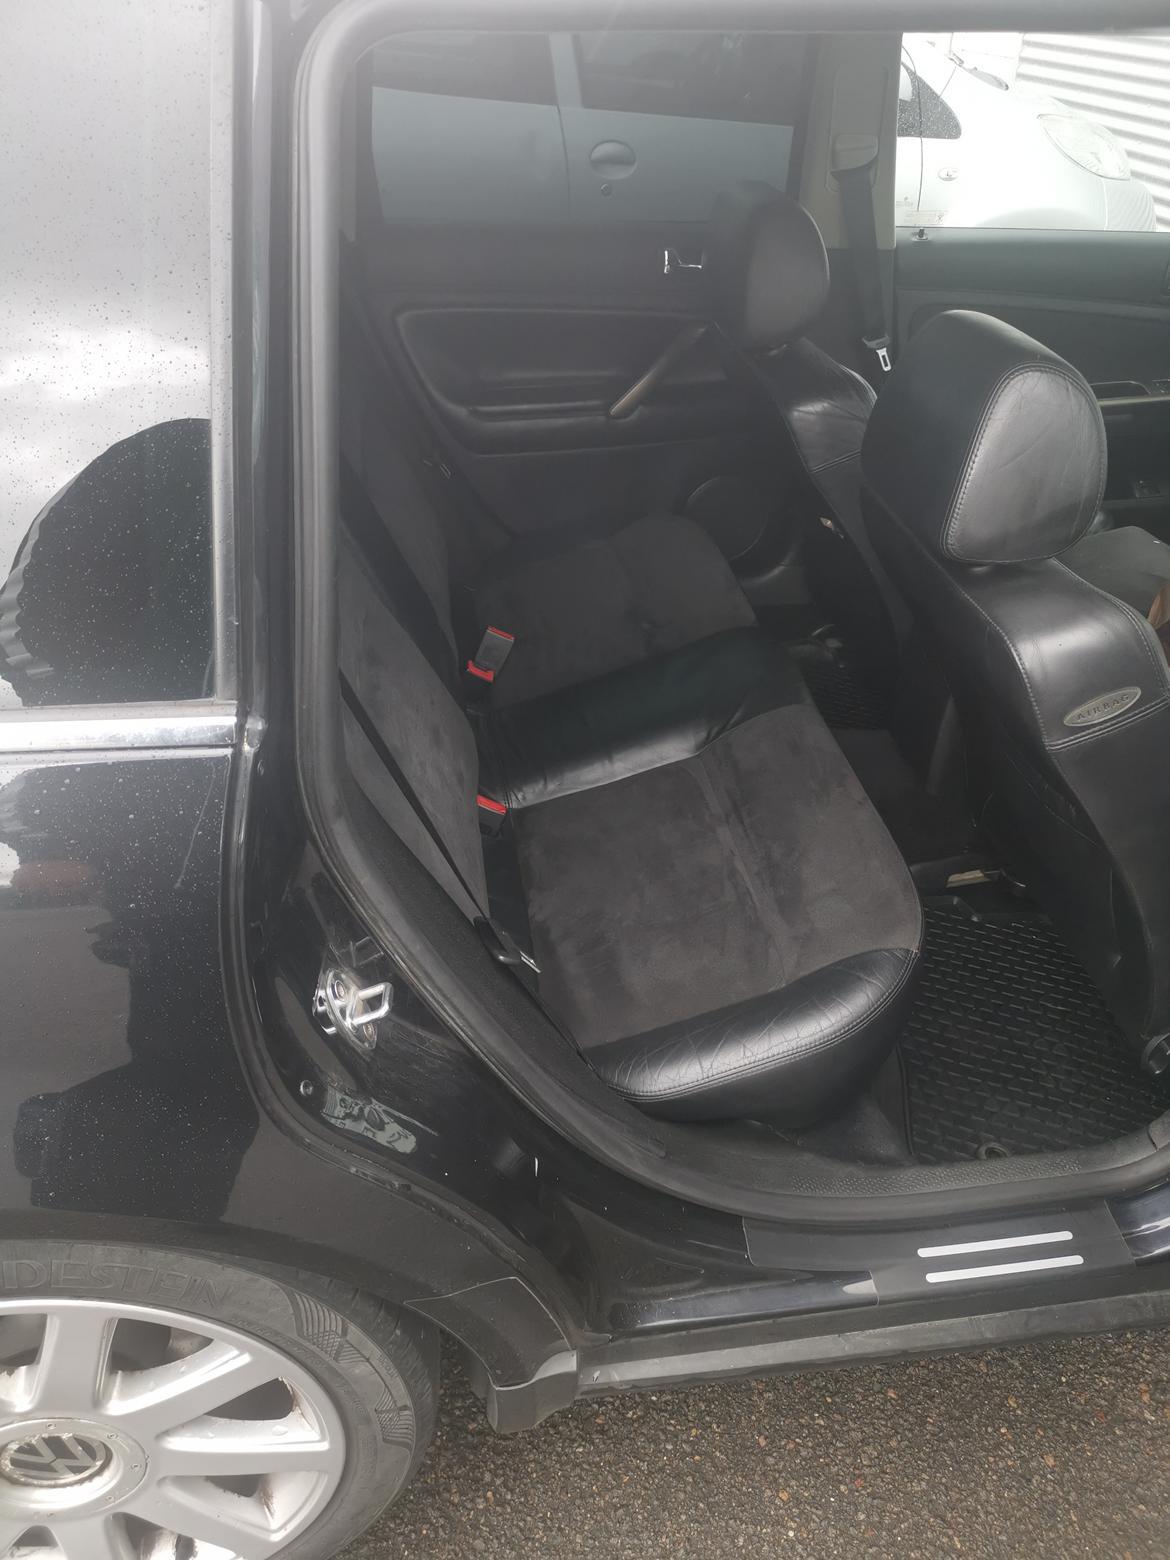 VW Passat 1.8T billede 4